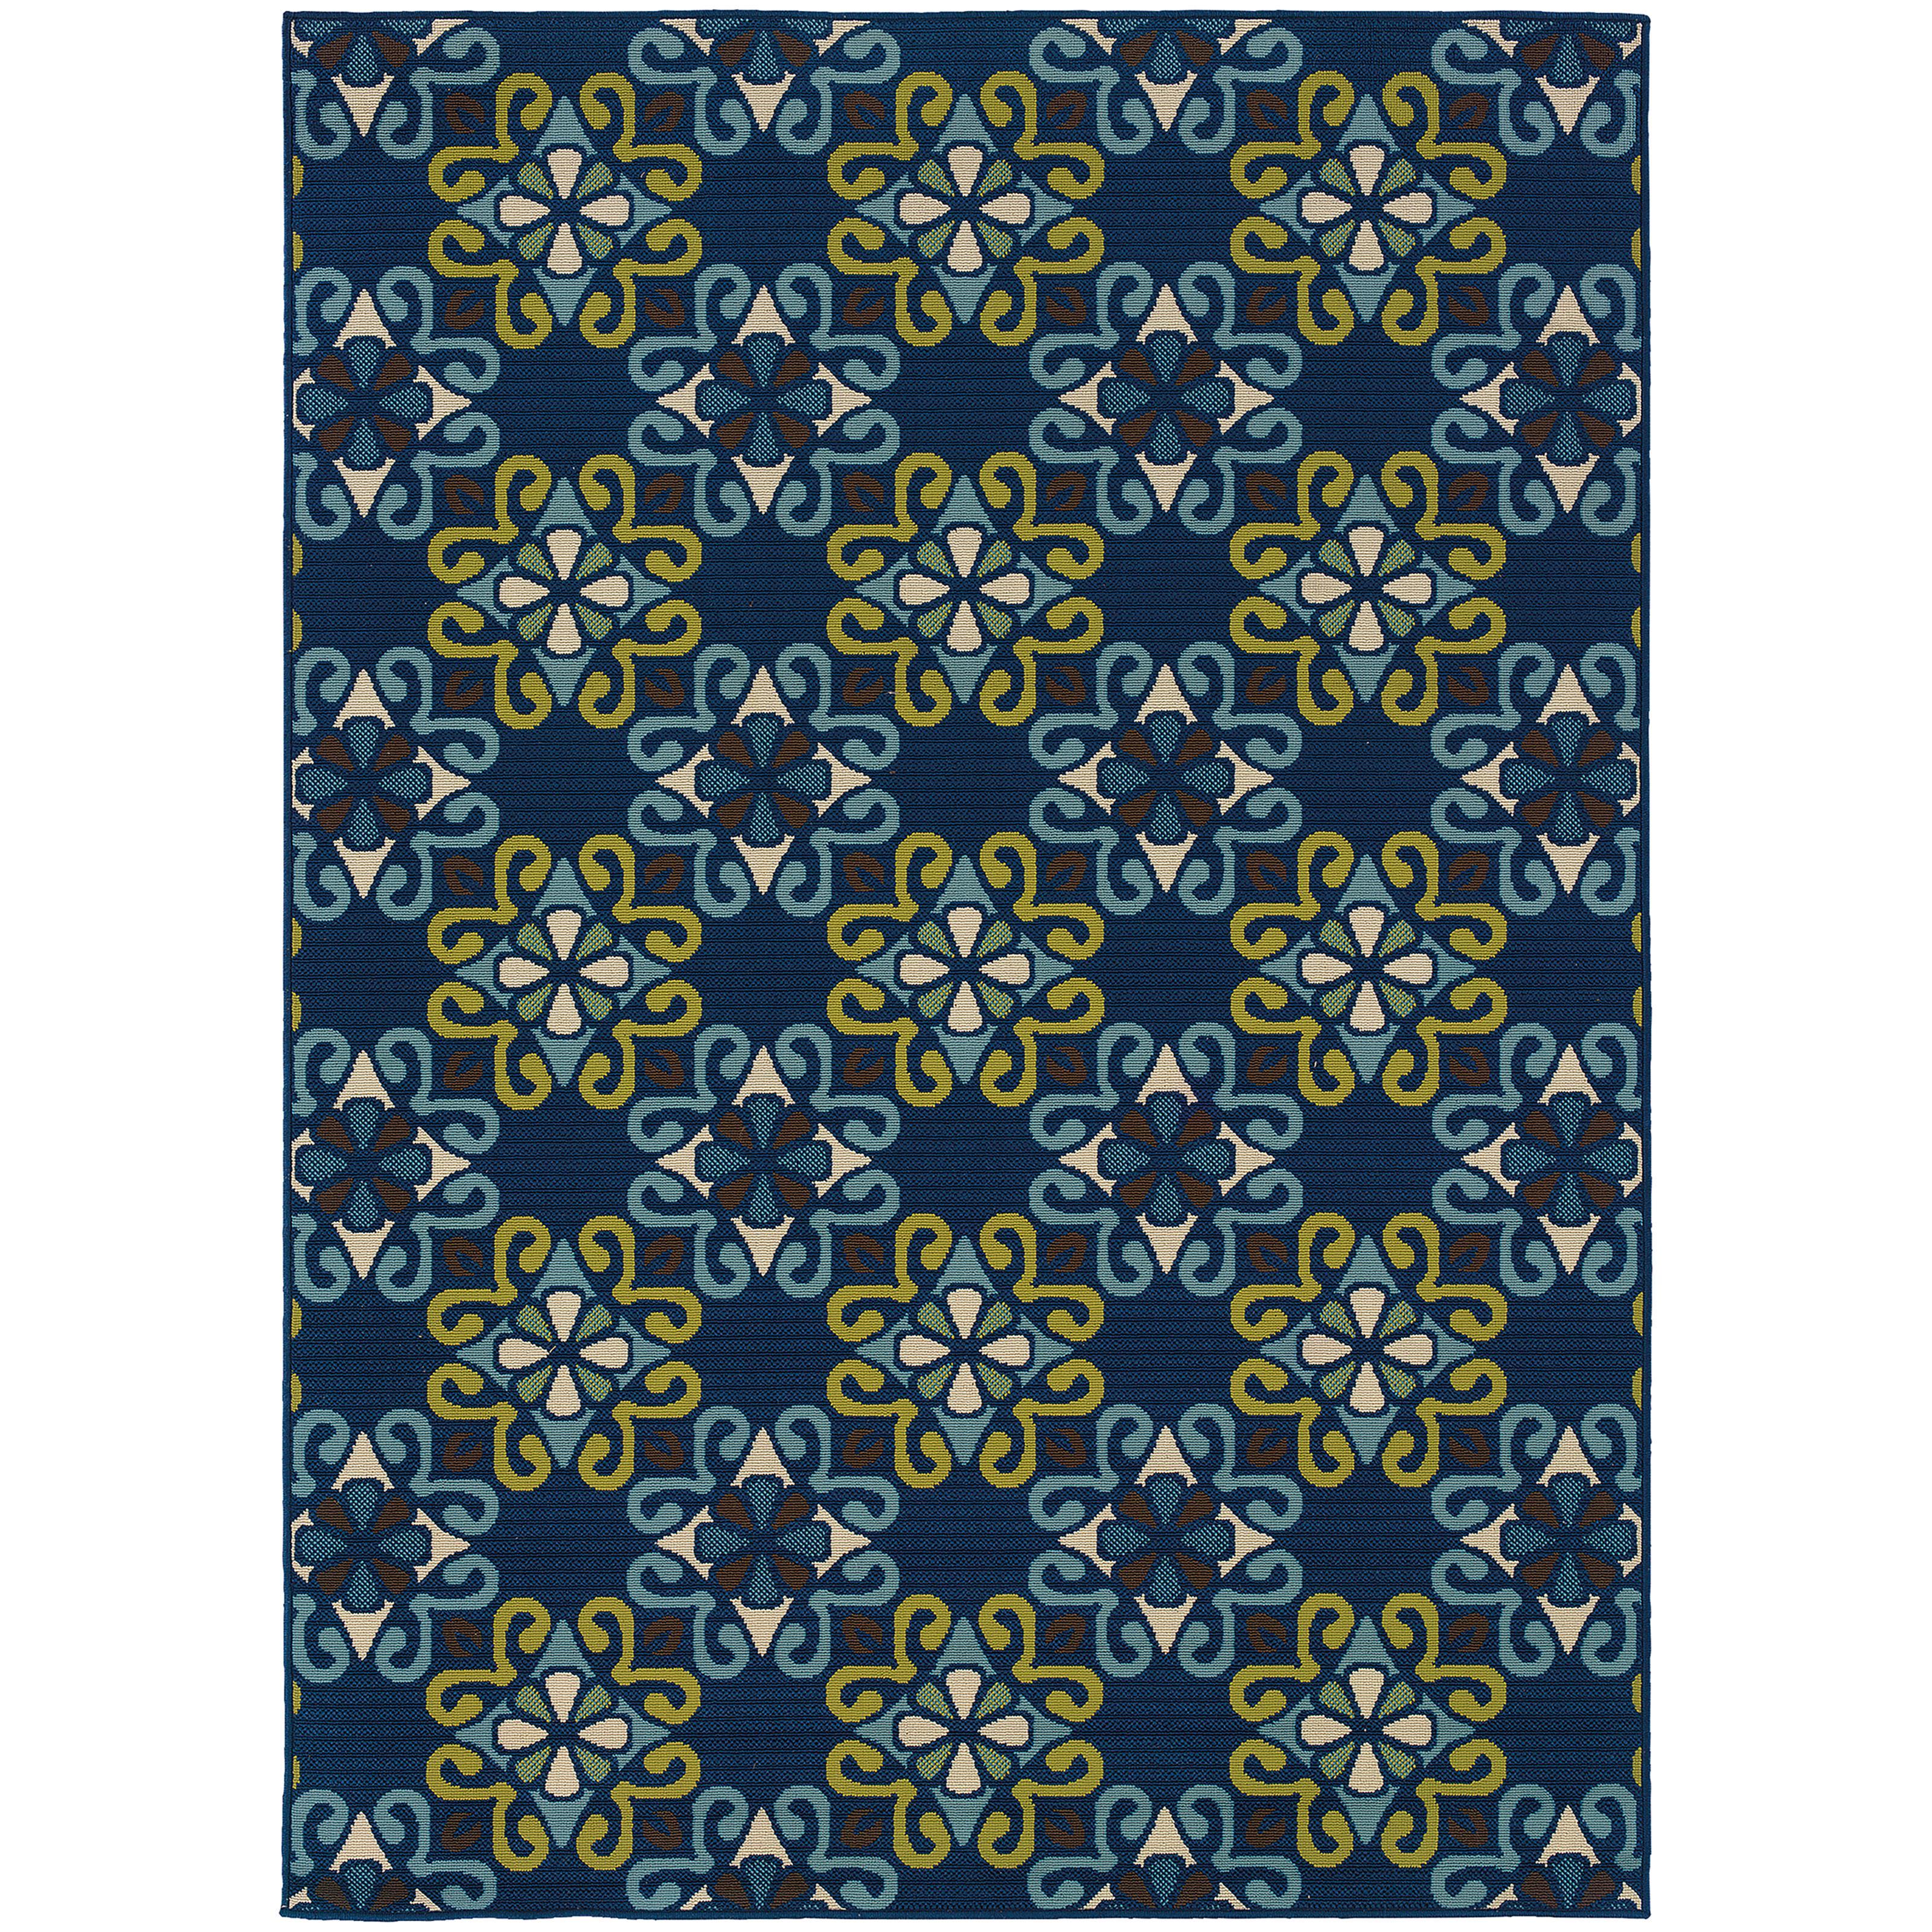 "Oriental Weavers Caspian 8' 6"" X 13' Rug - Item Number: C3331L259396ST"